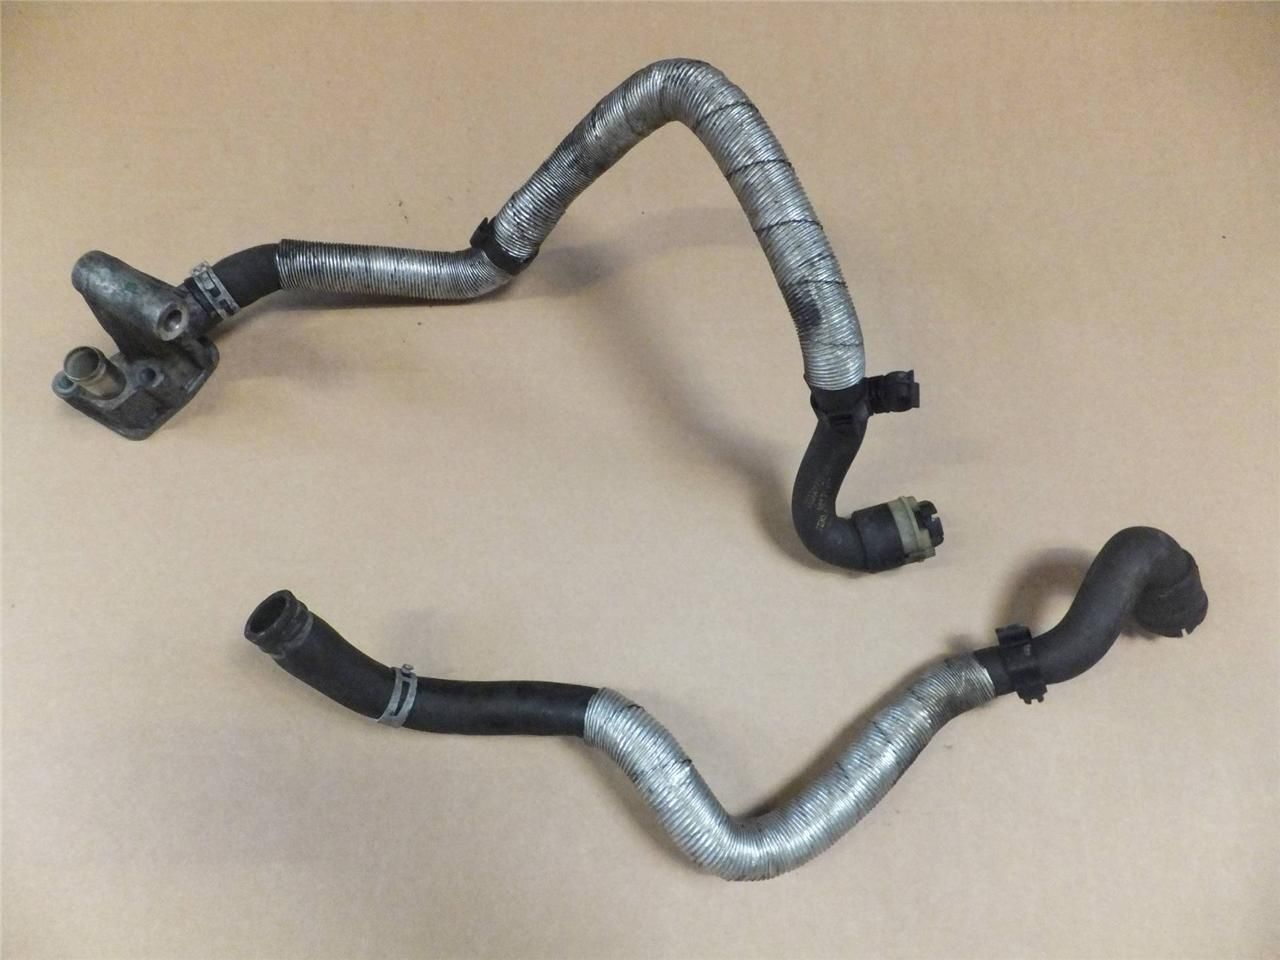 Hard/drive♢Zafira-car-body-to-engine-pipes.Millicent_Hawk